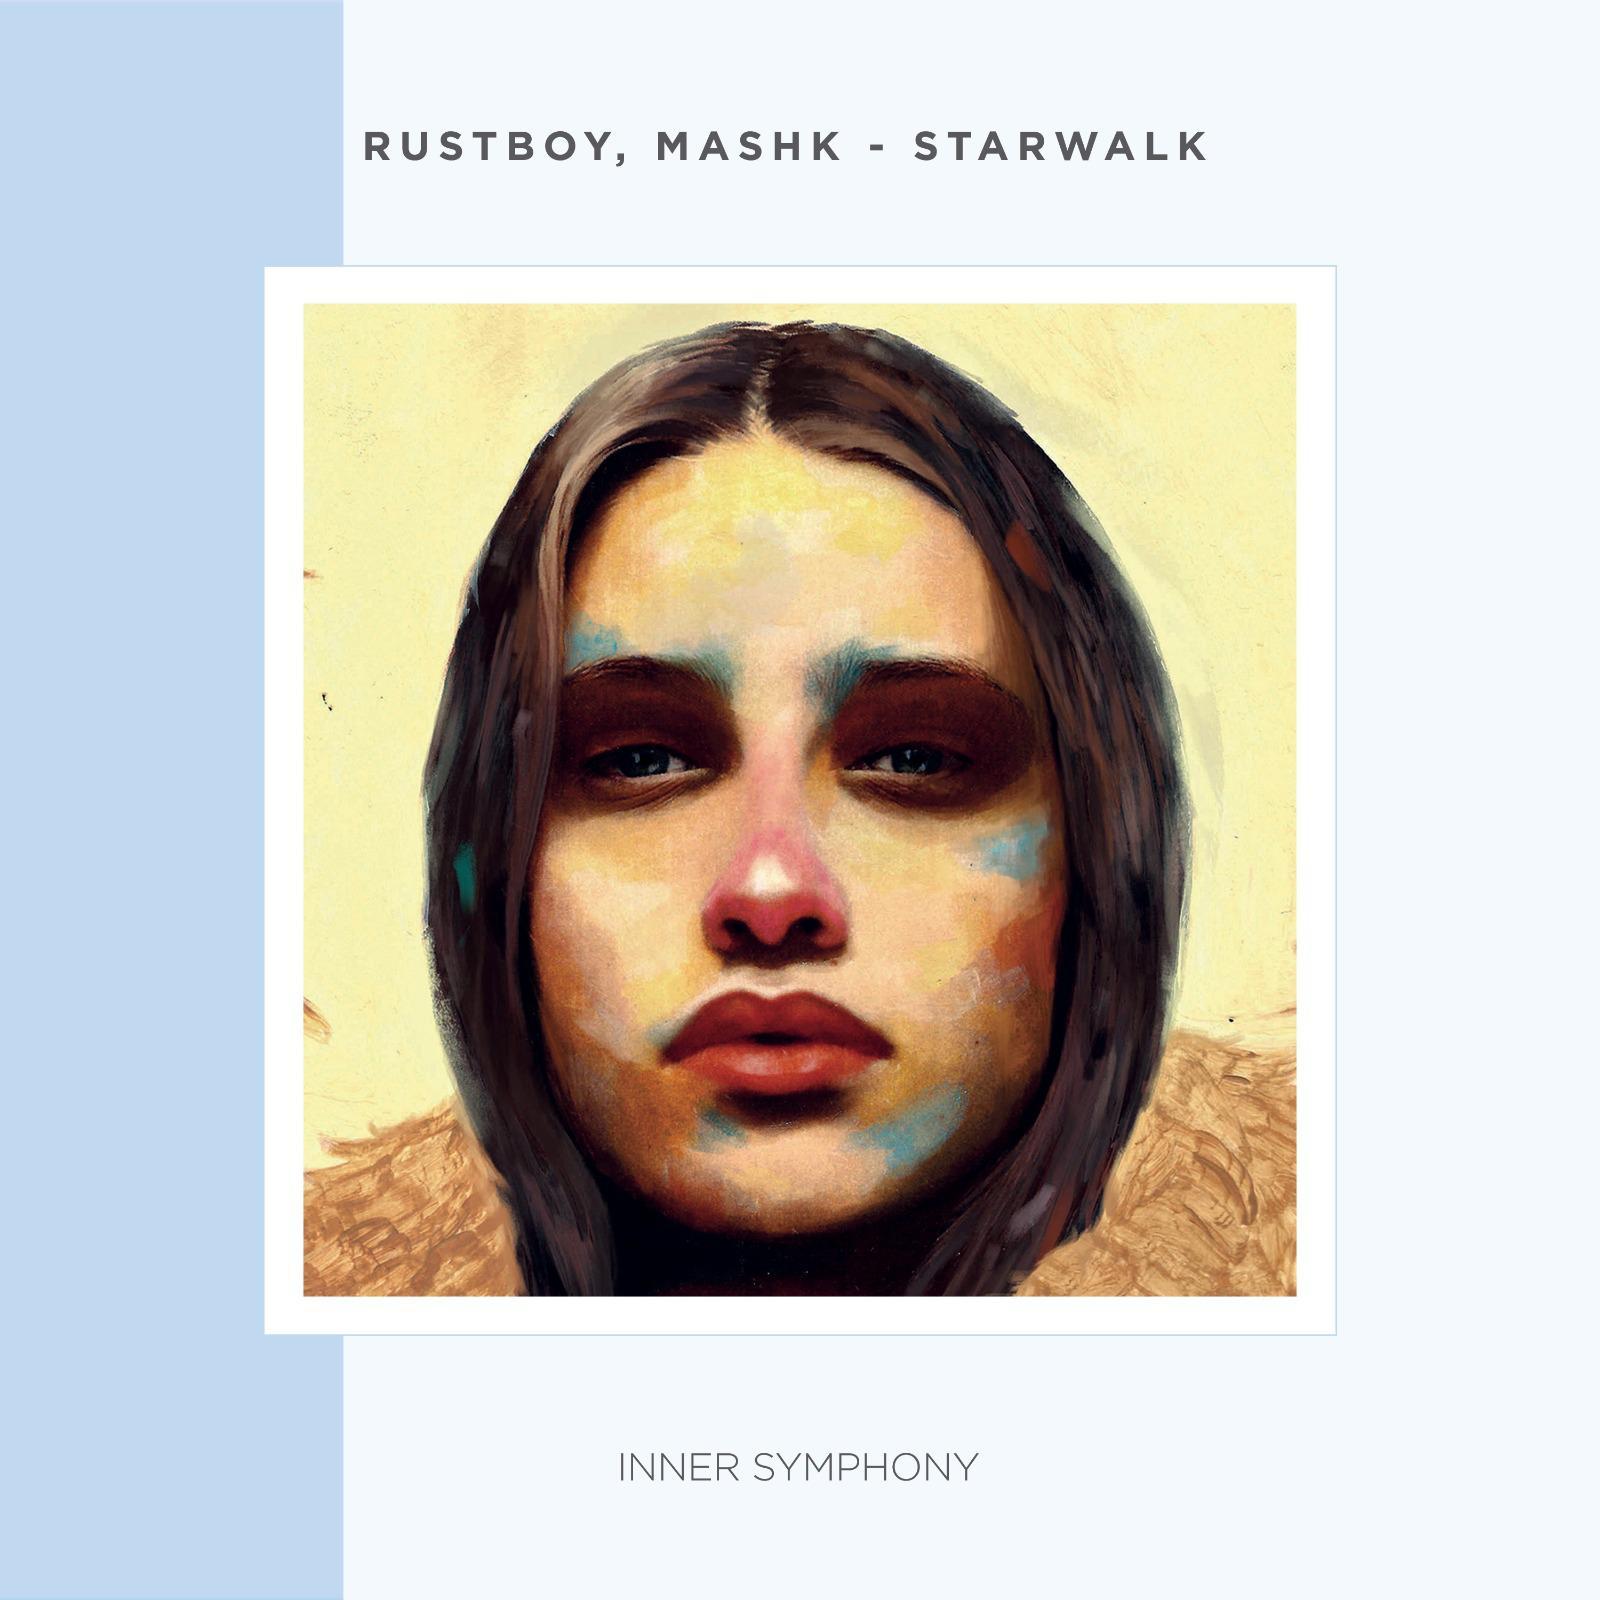 Rustboy, Mashk – Starwalk EP